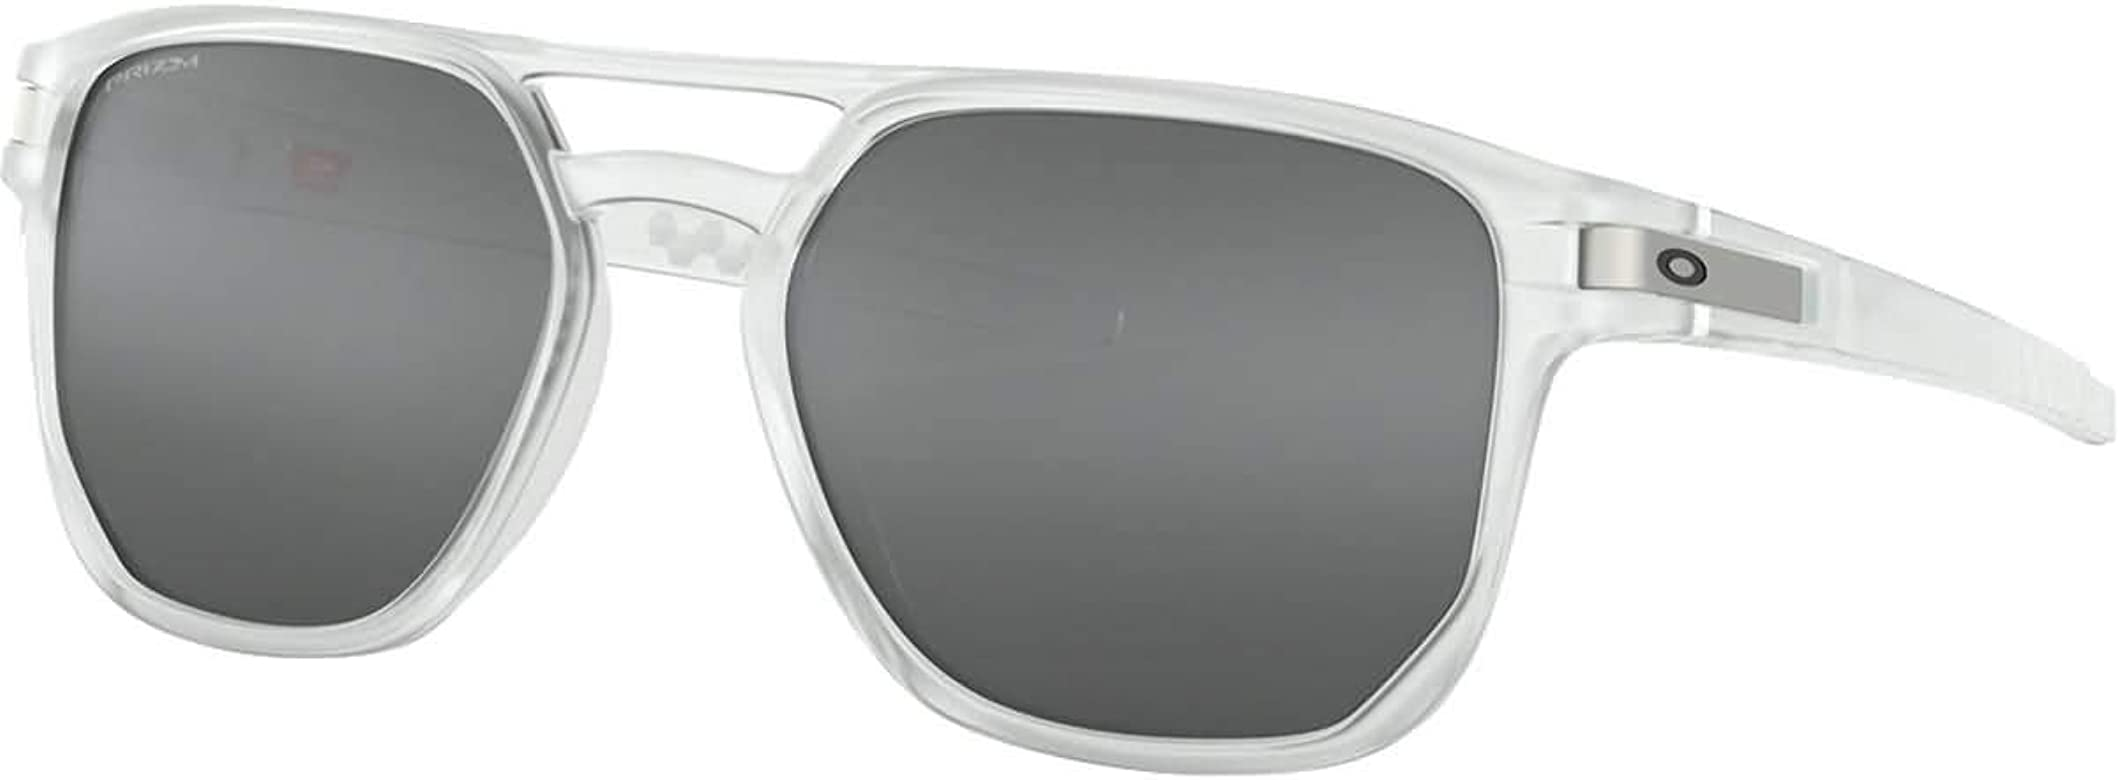 Oakley 0OO9436 Gafas de sol, Matte Clear, 54 para Hombre ...